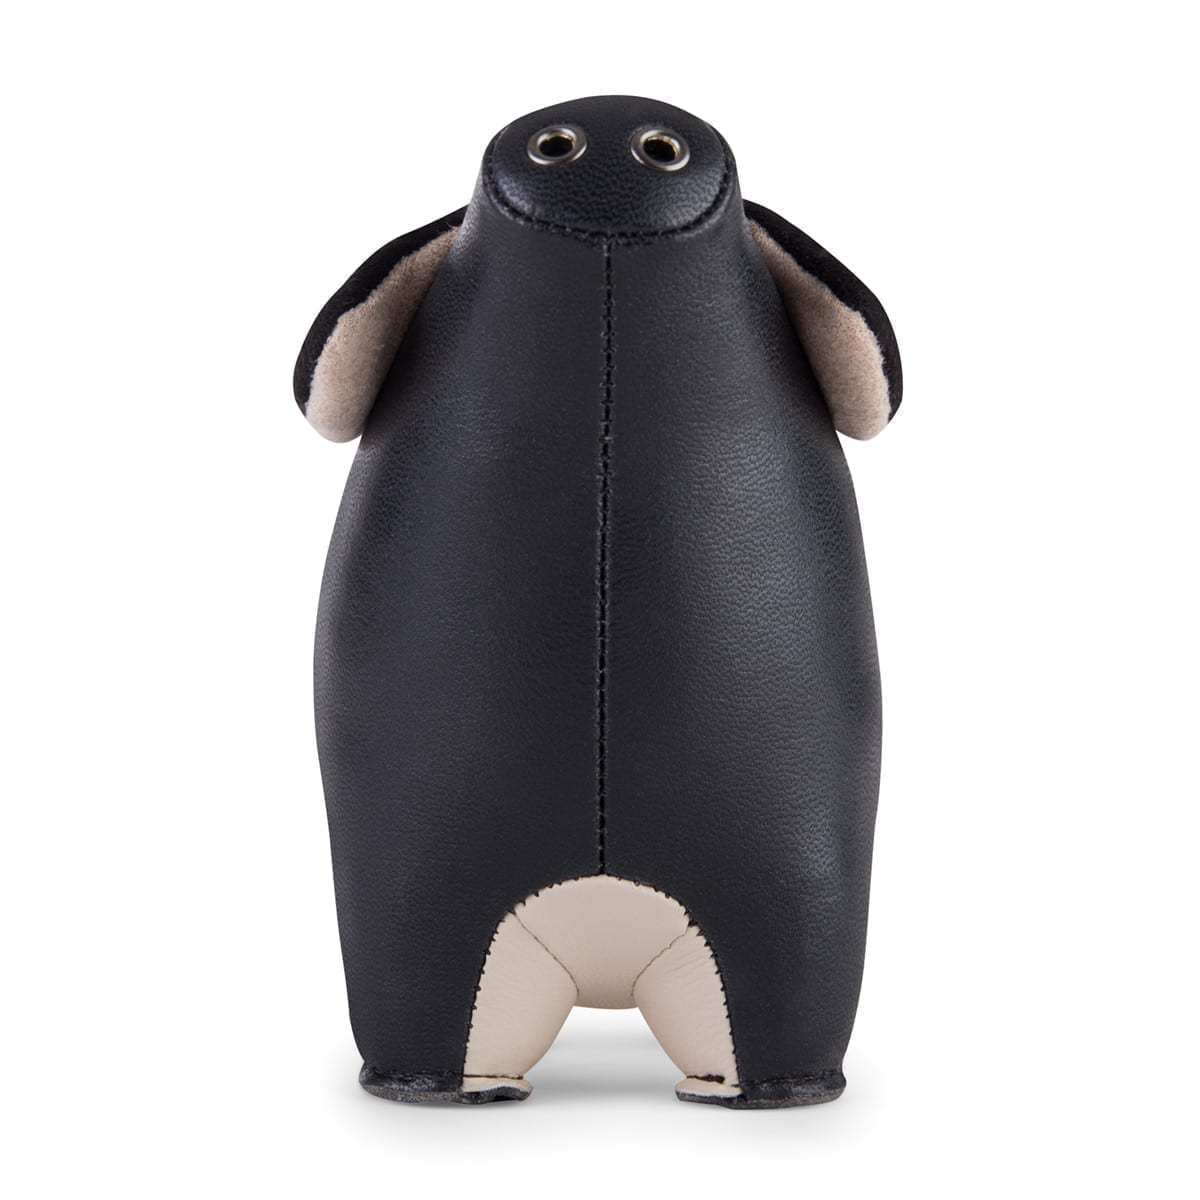 Paperweight Pig Black